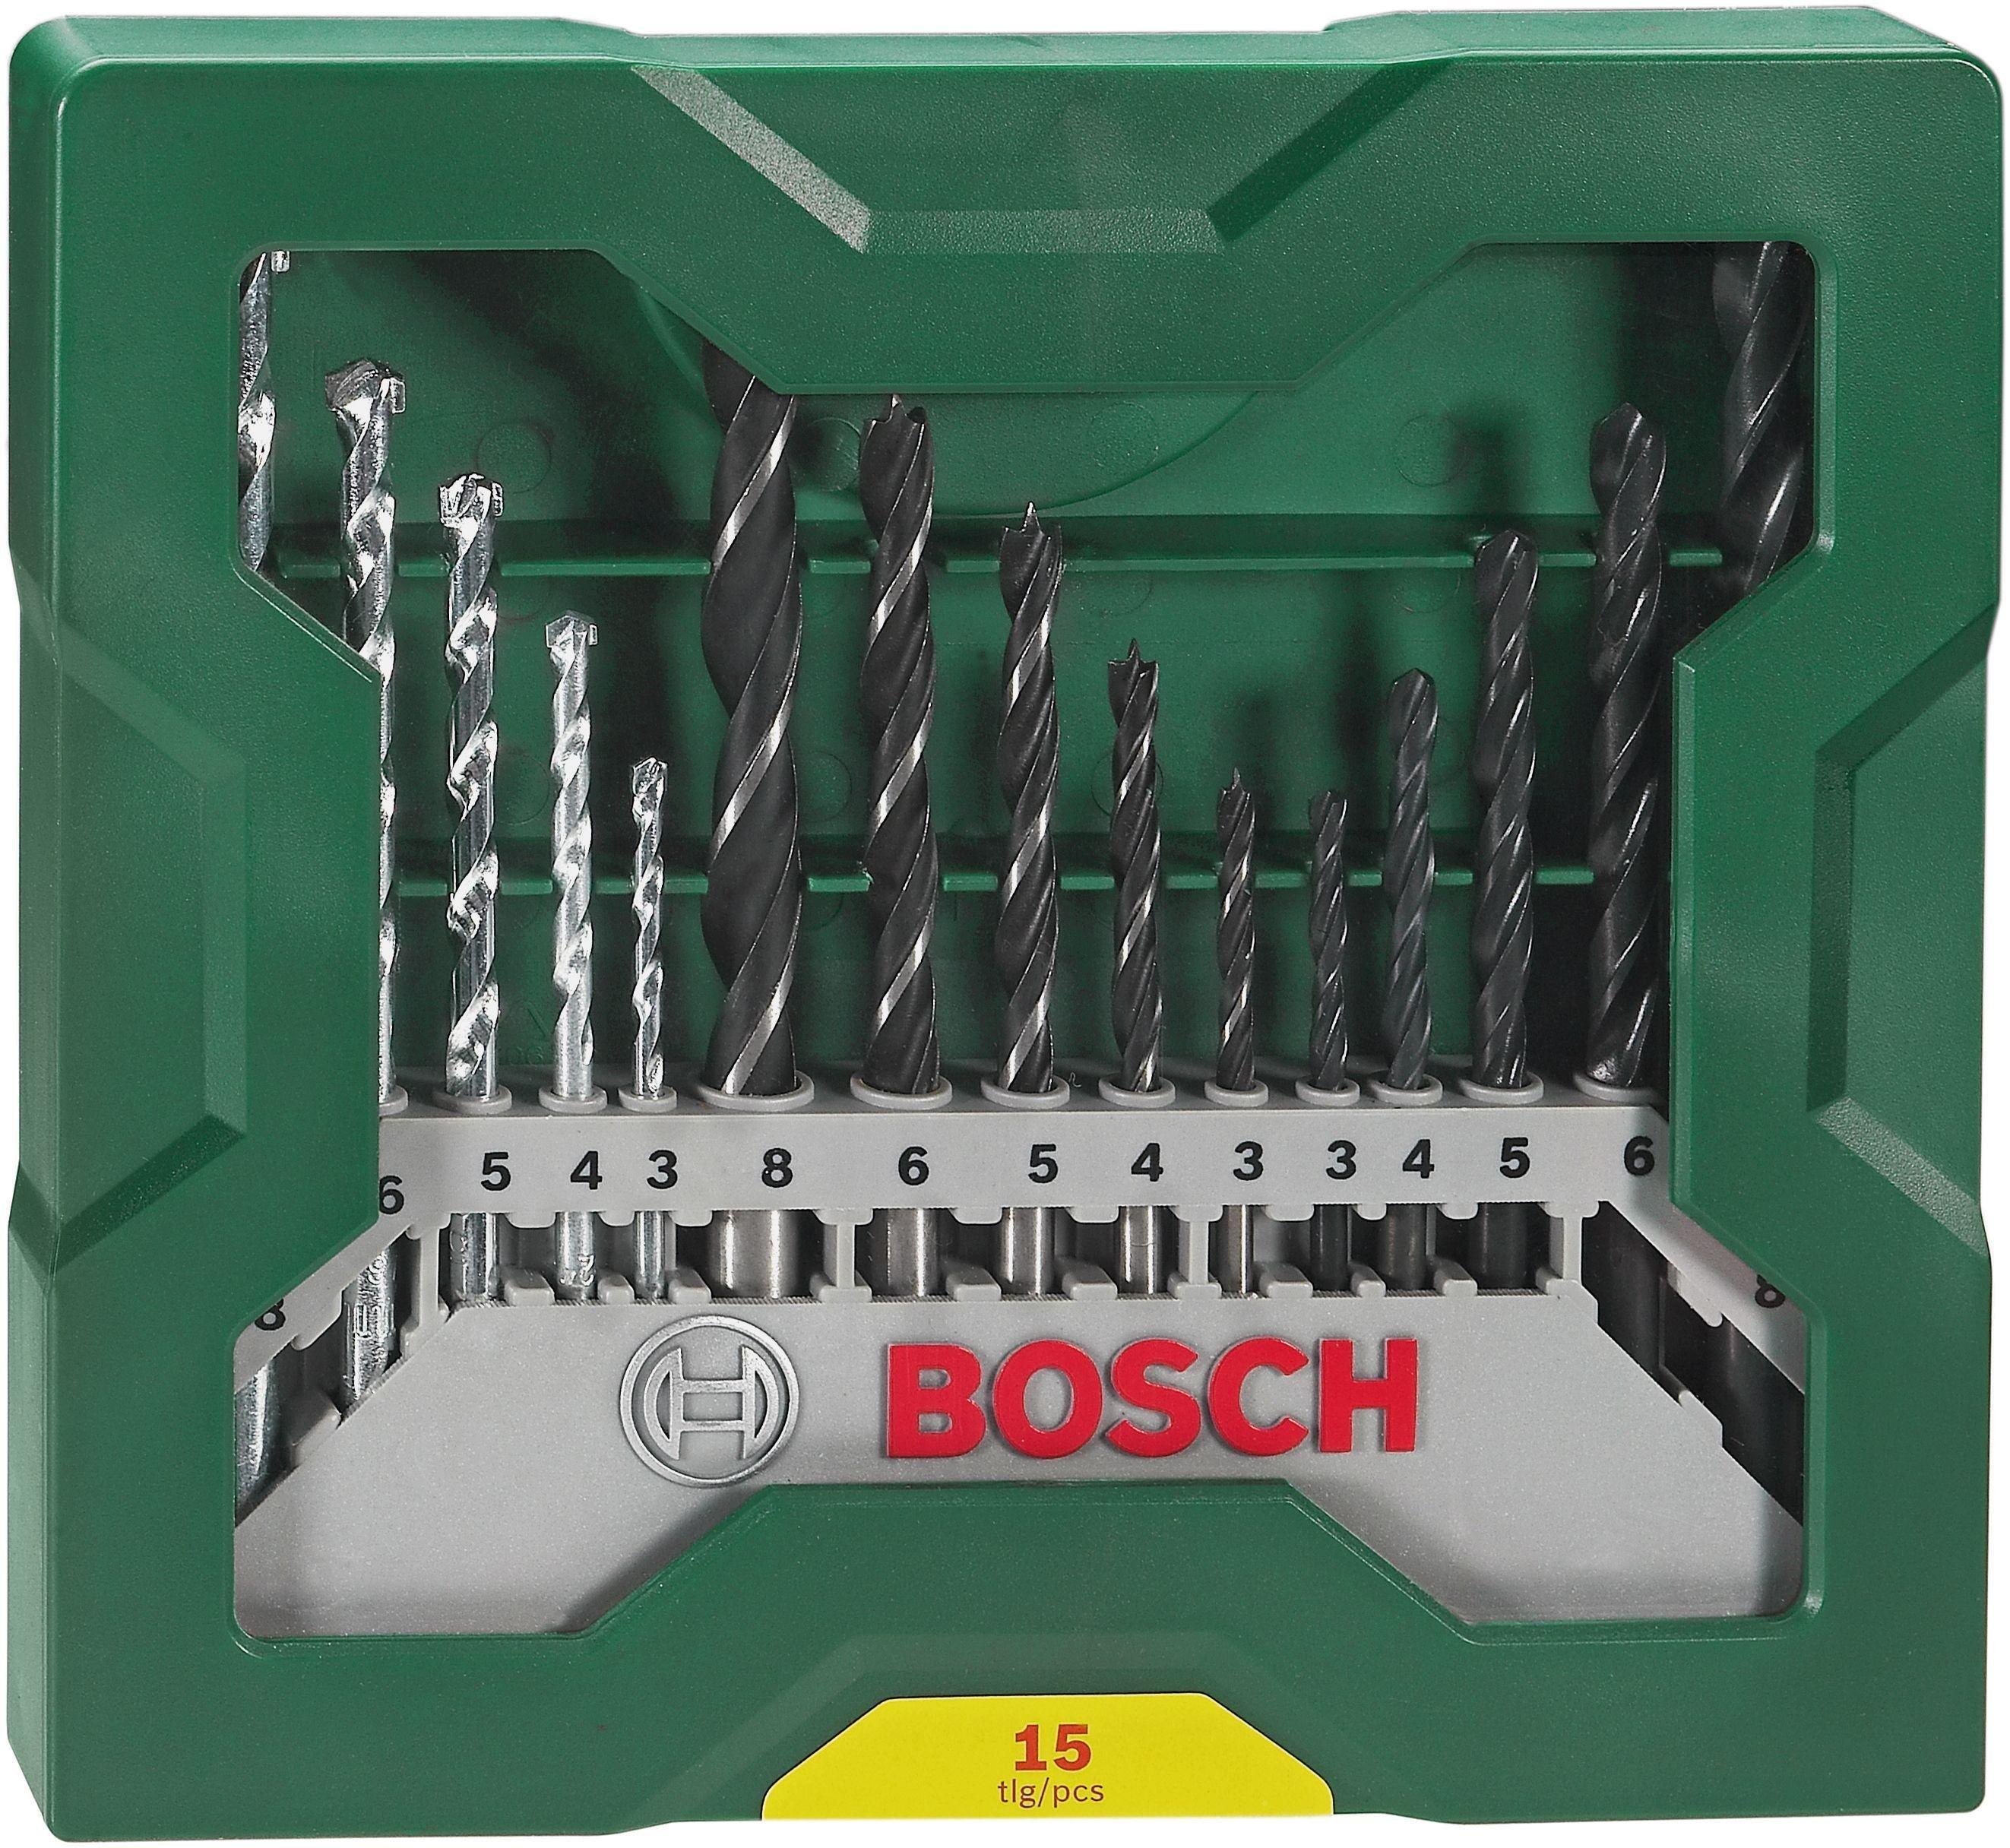 Image of Bosch - 15 Piece X-Line Drill Bit Set